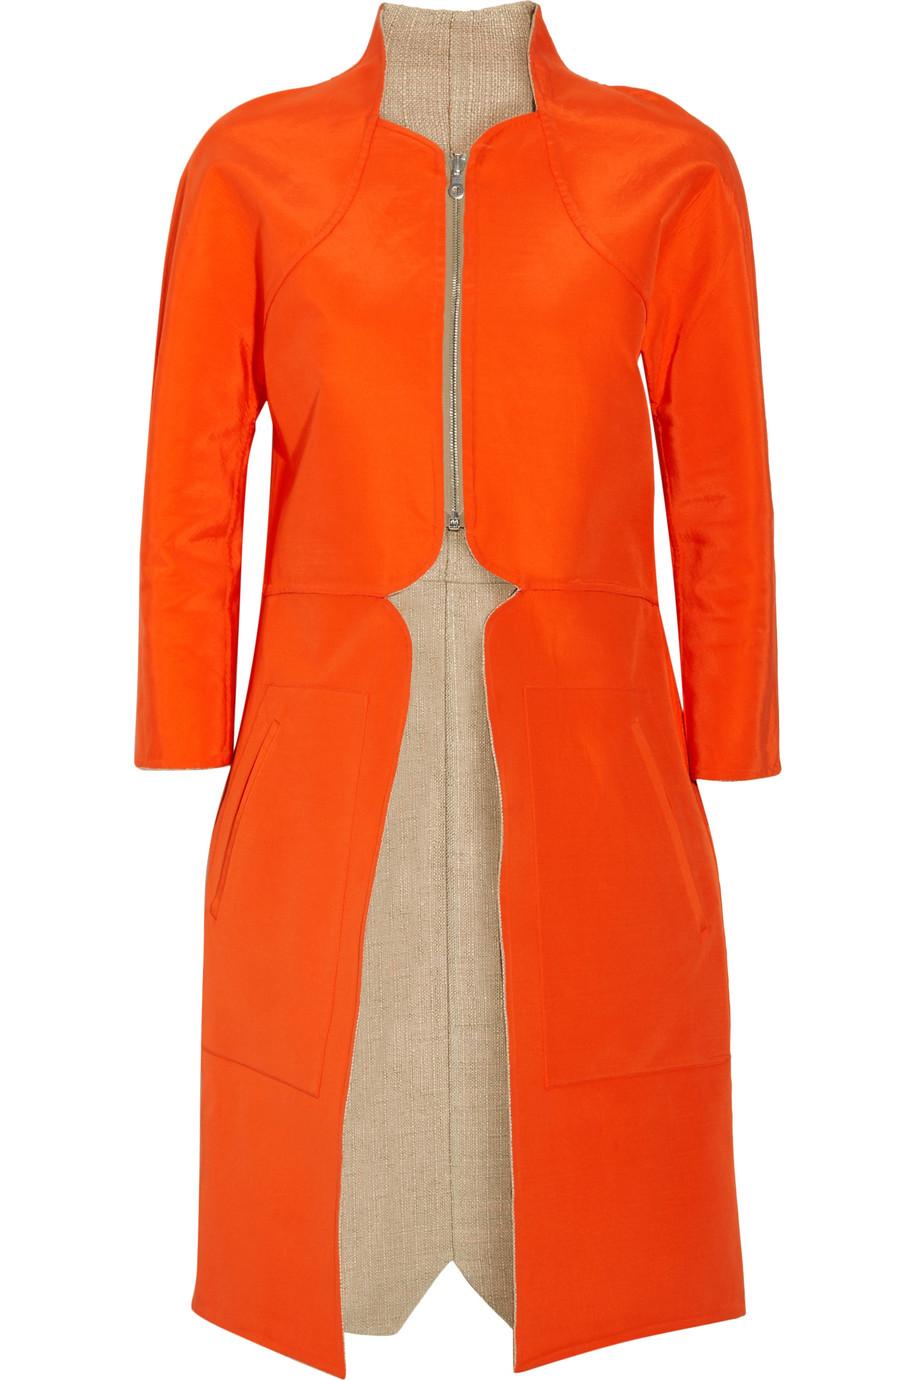 Lela Rose Reversible Silk And Linen Coat In Orange Lyst